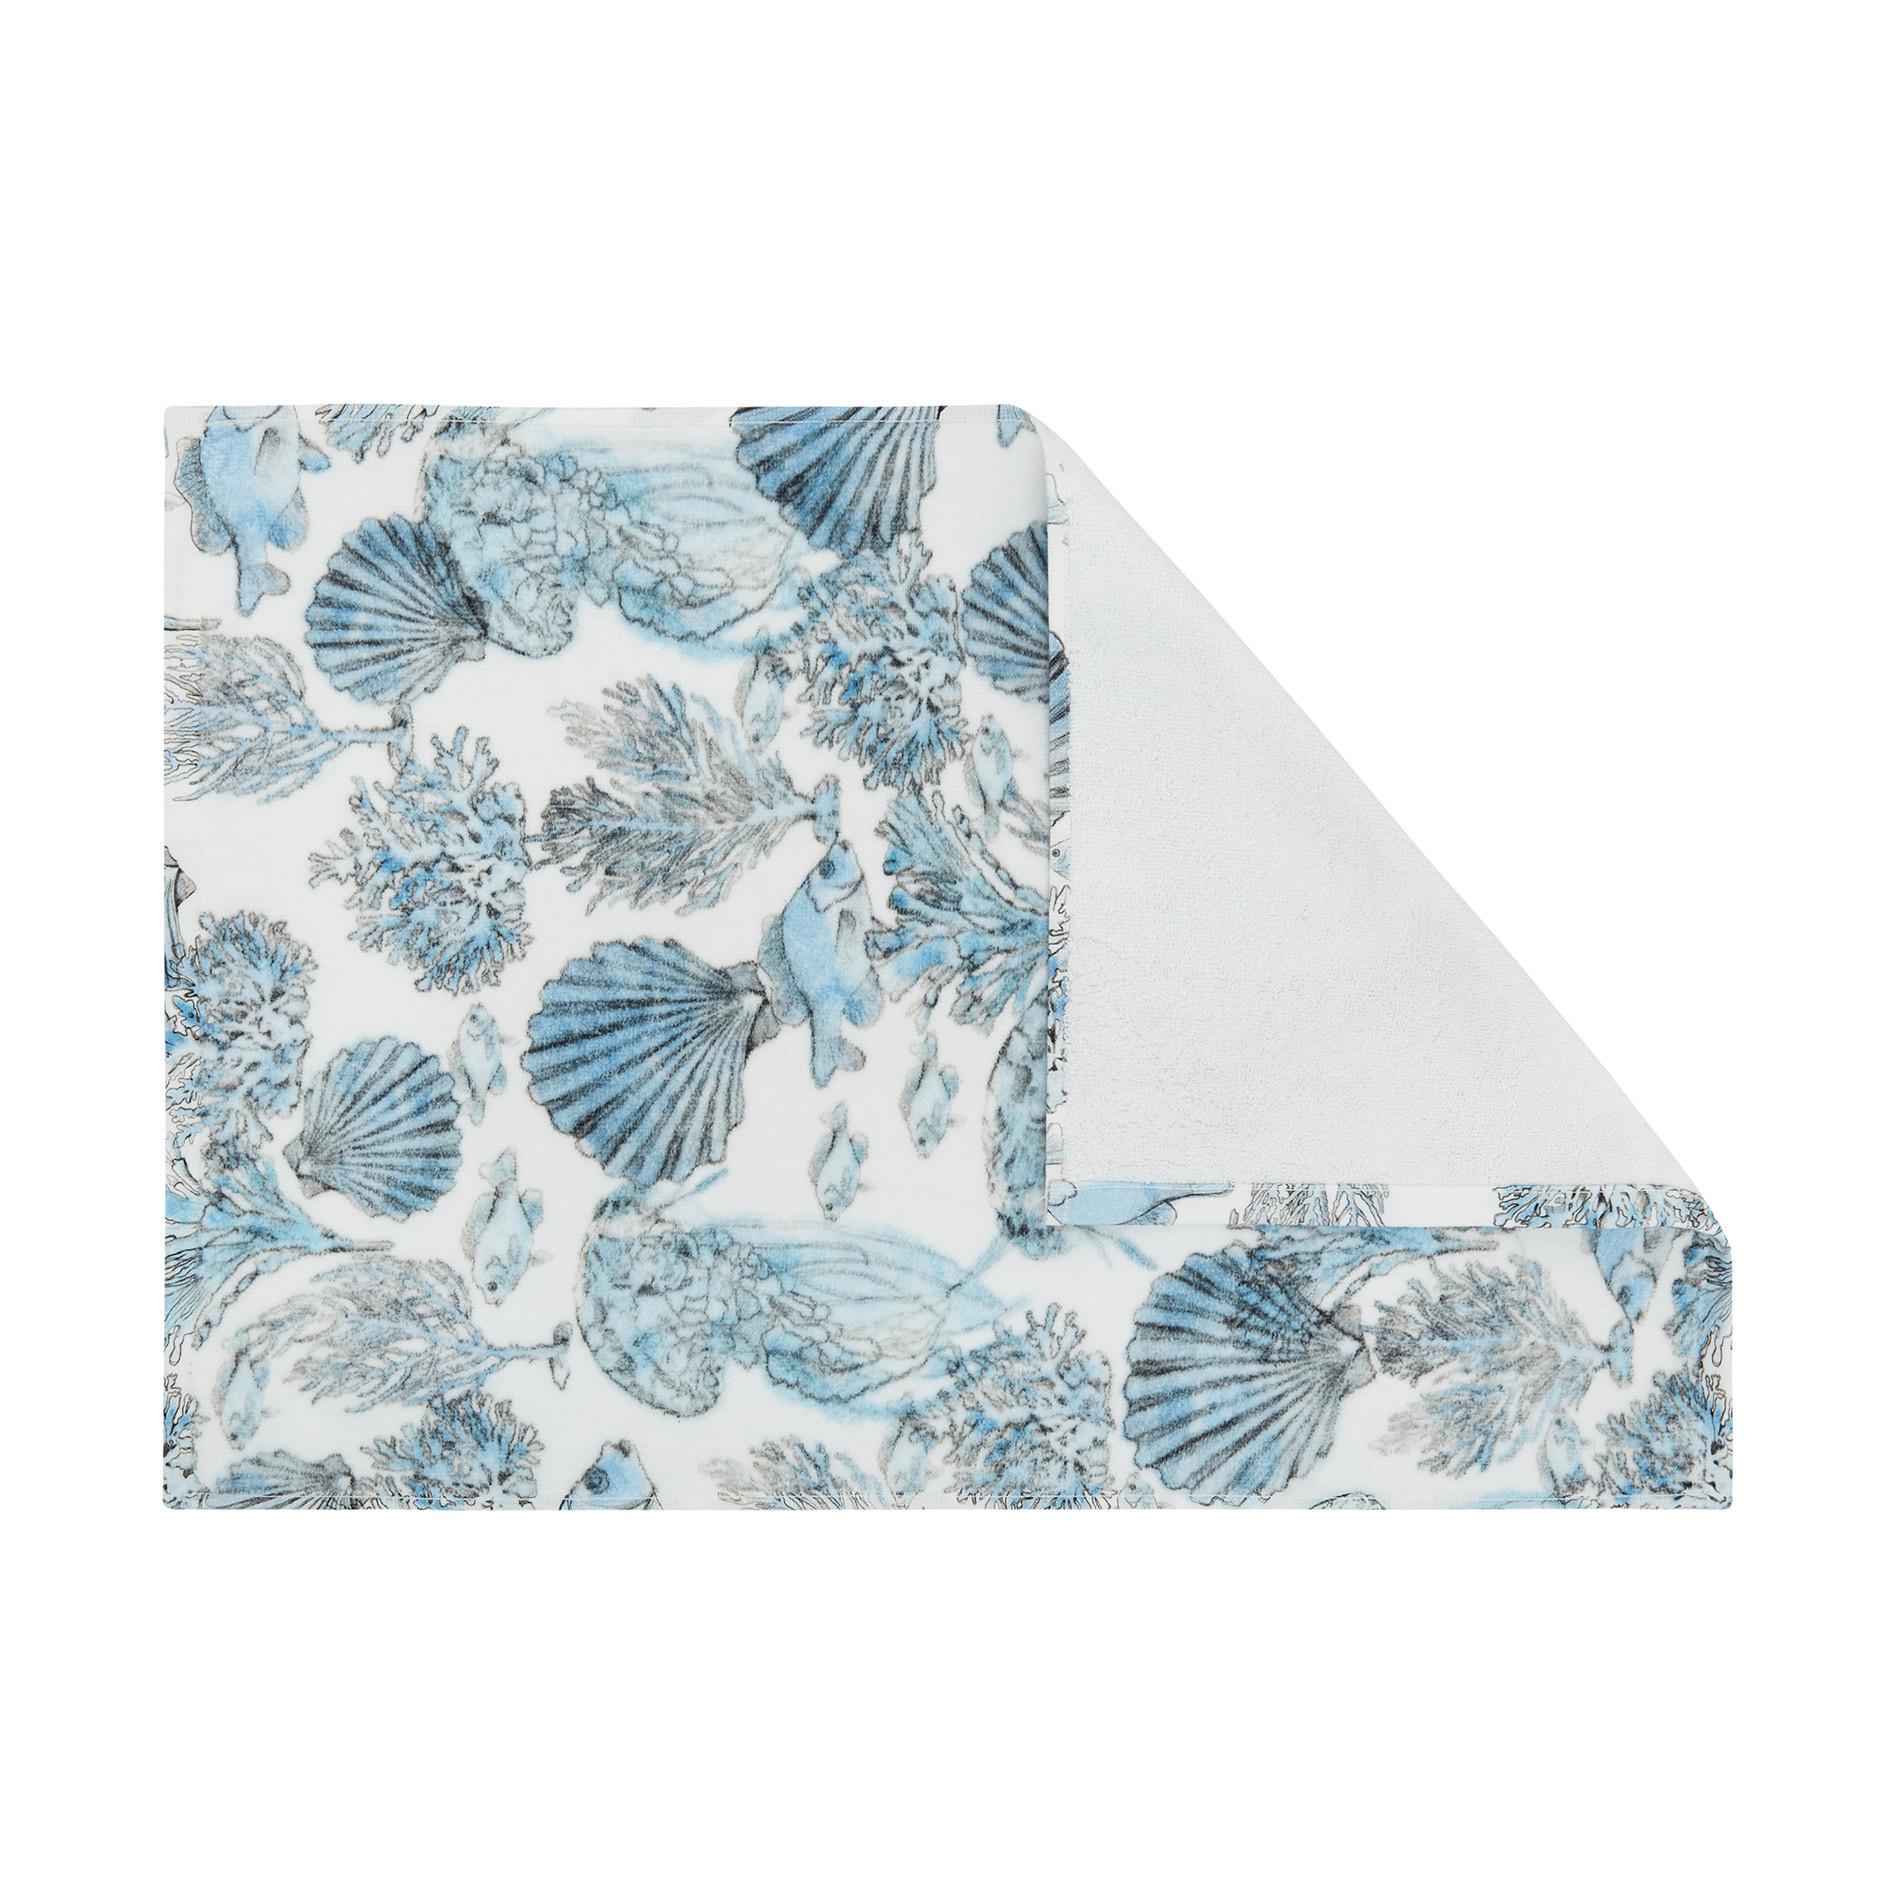 Asciugamano cotone velour stampa fondale marino, Bianco, large image number 2